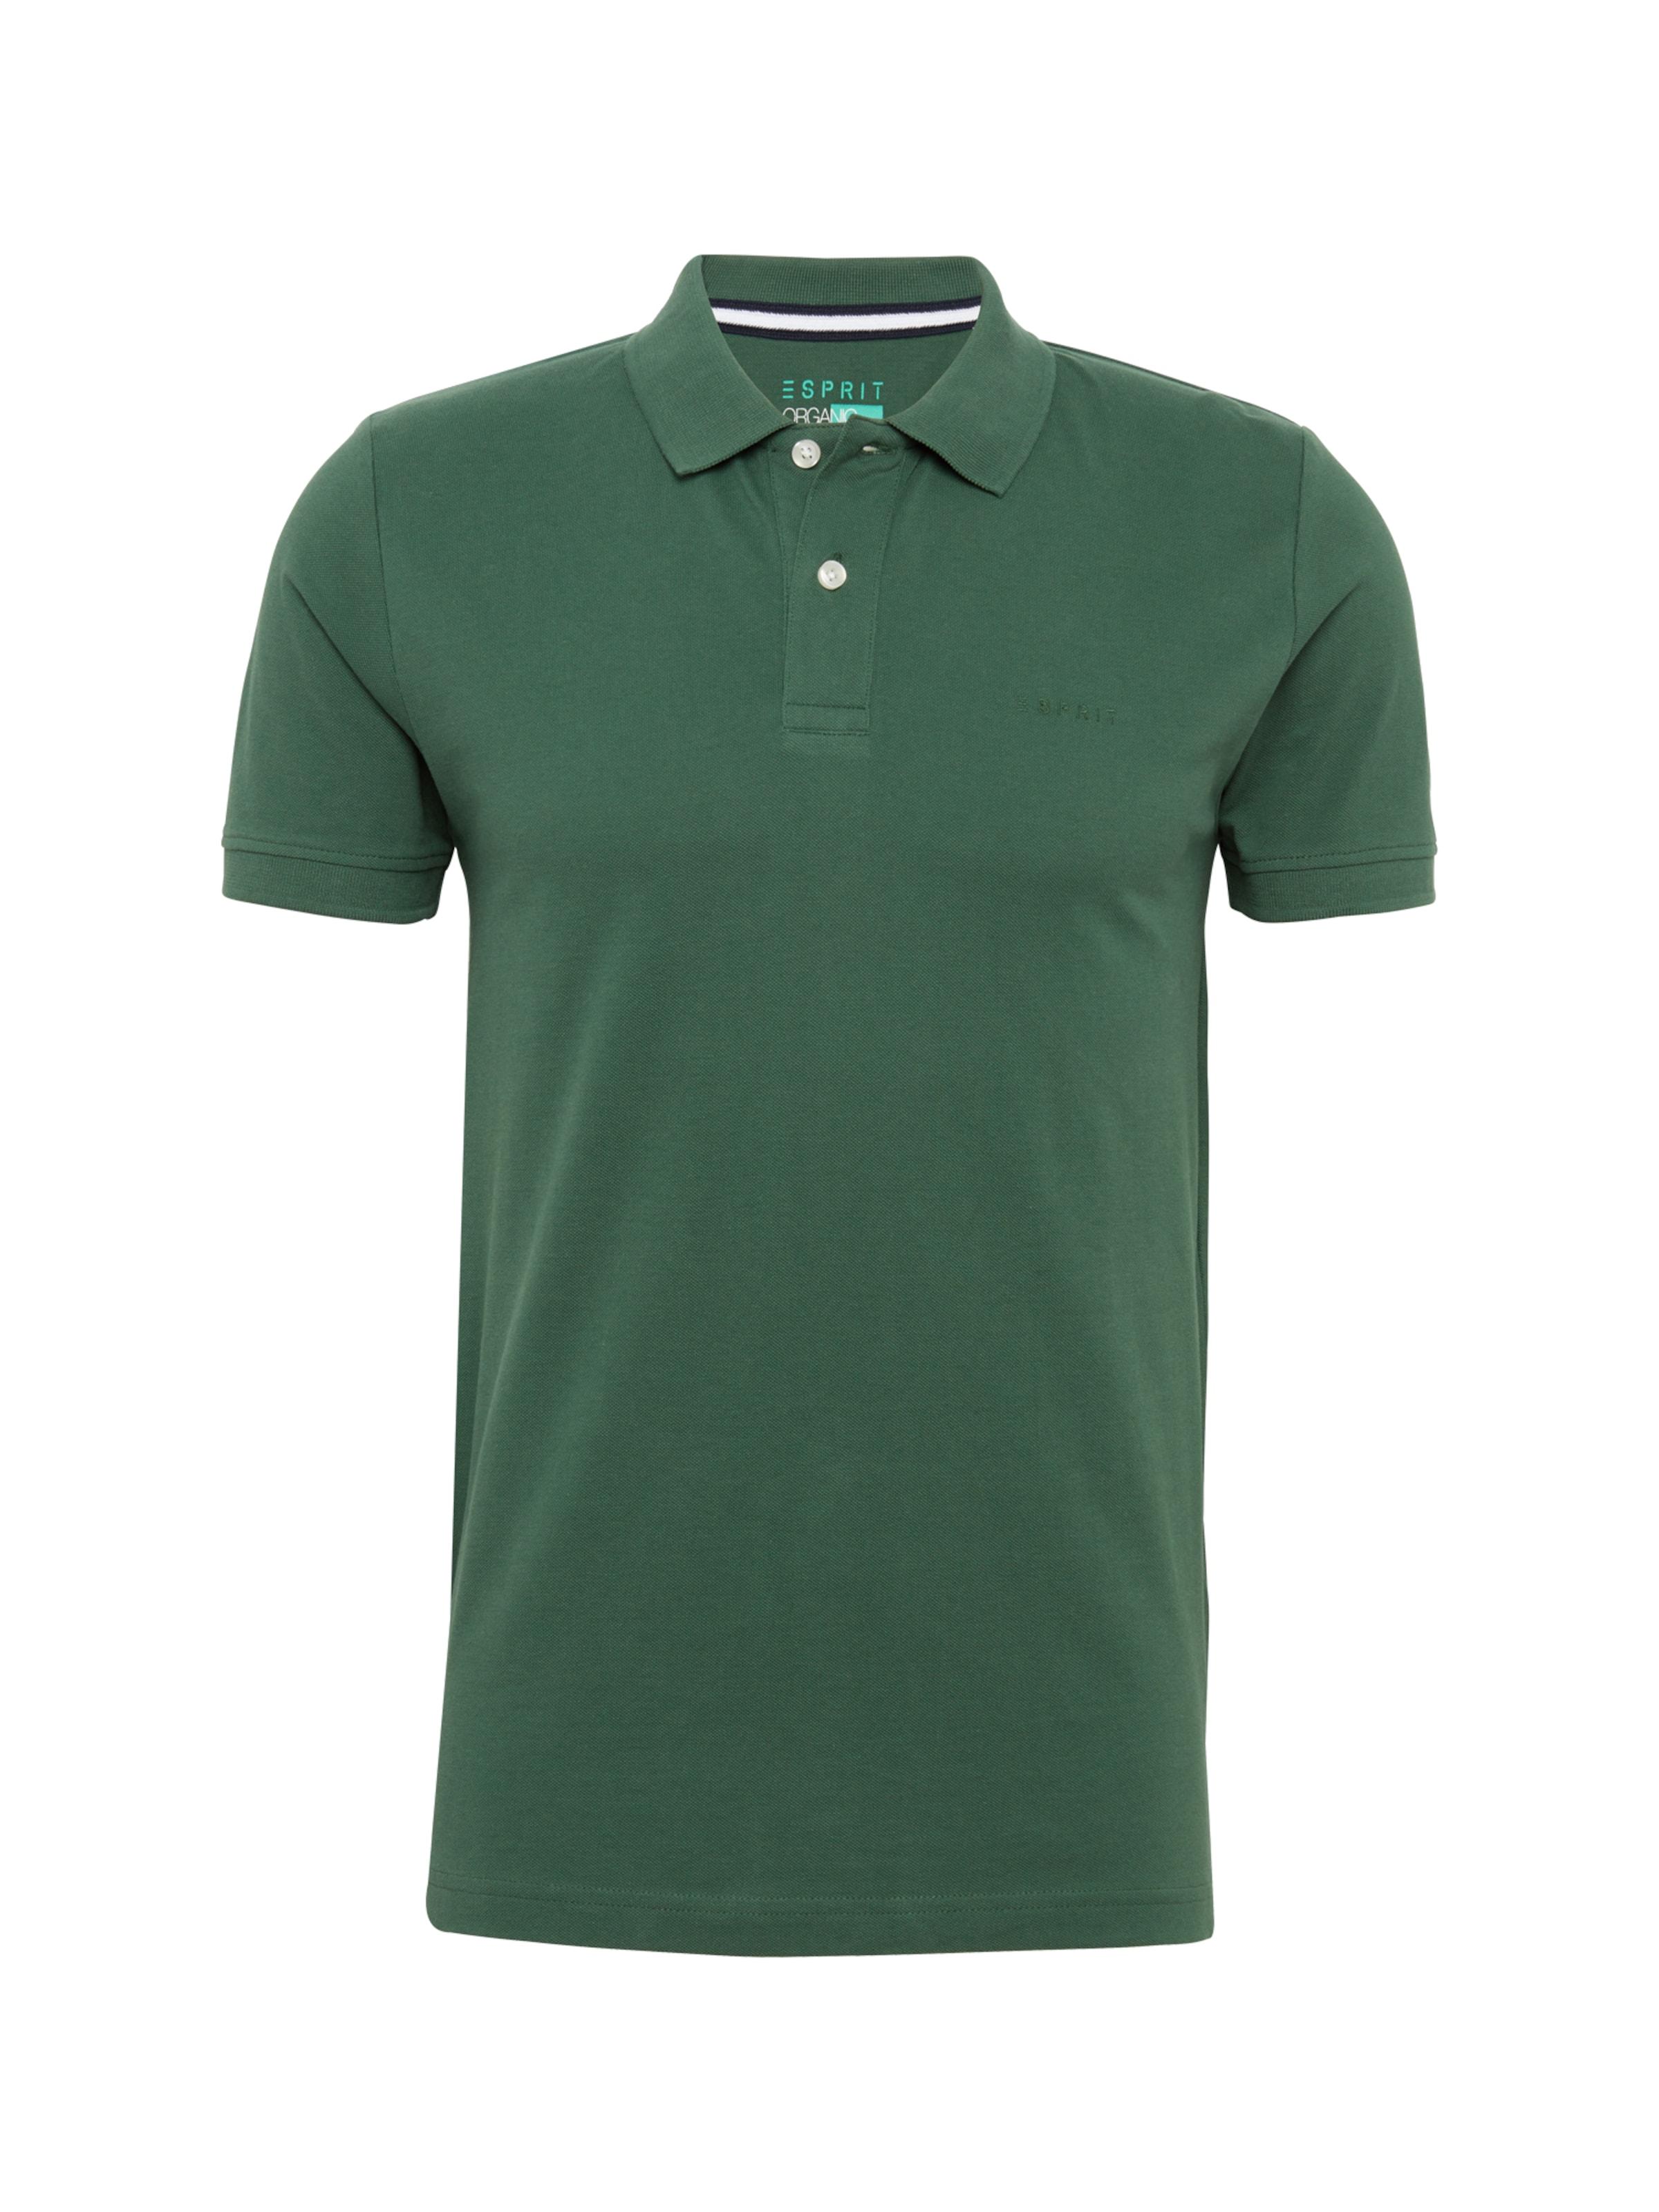 Foncé N Po shirt 'ocs Vert Esprit Piq' En T Co BhQCxtsrd